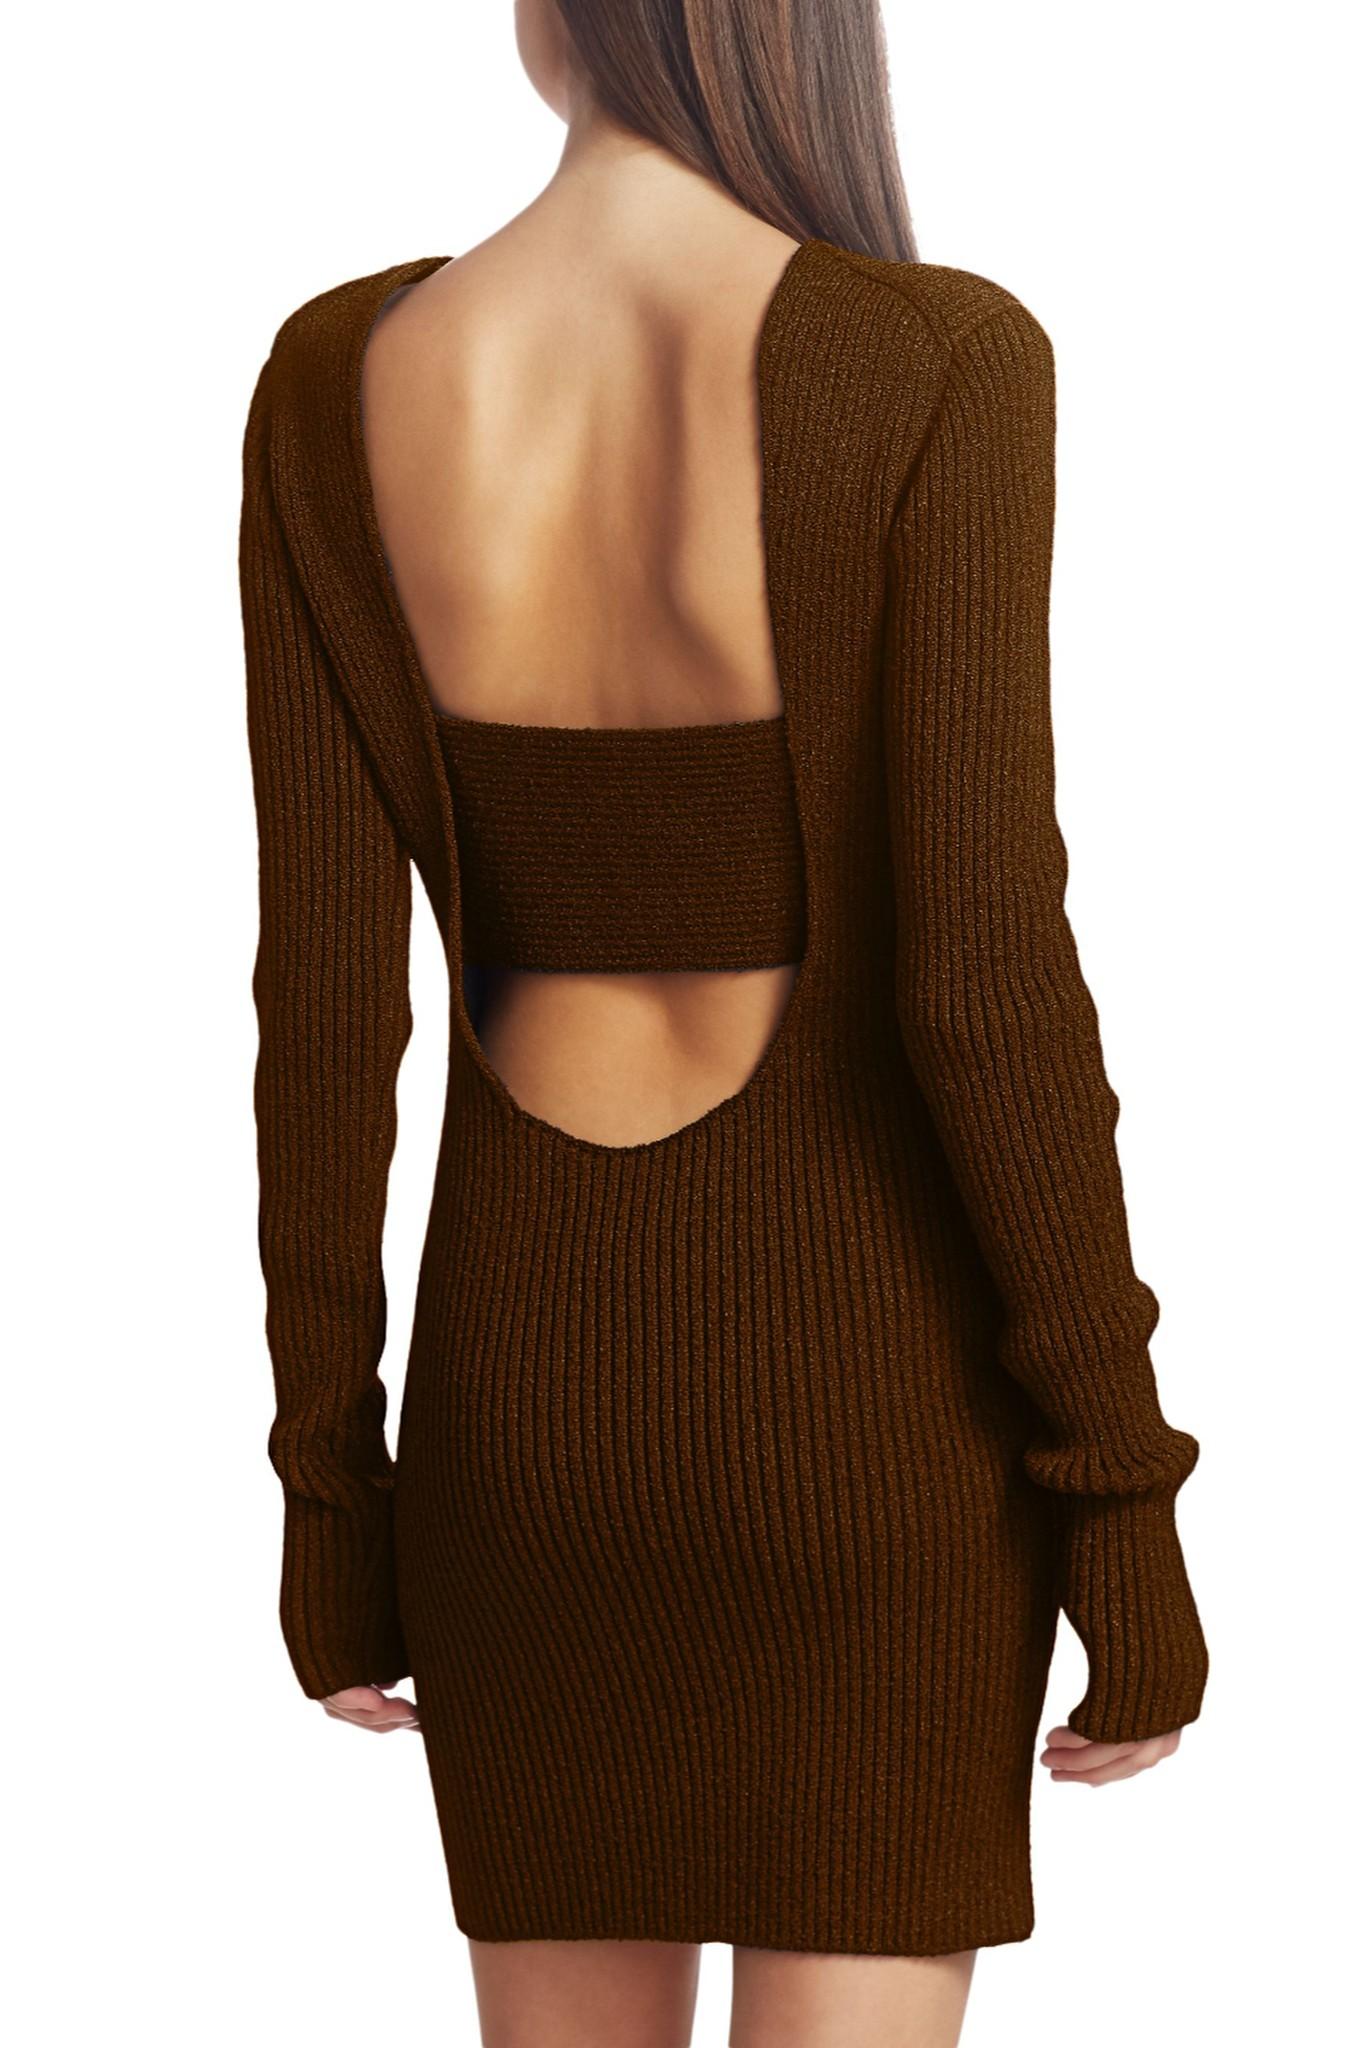 Bottega Veneta wrapped knit silk blend dress.